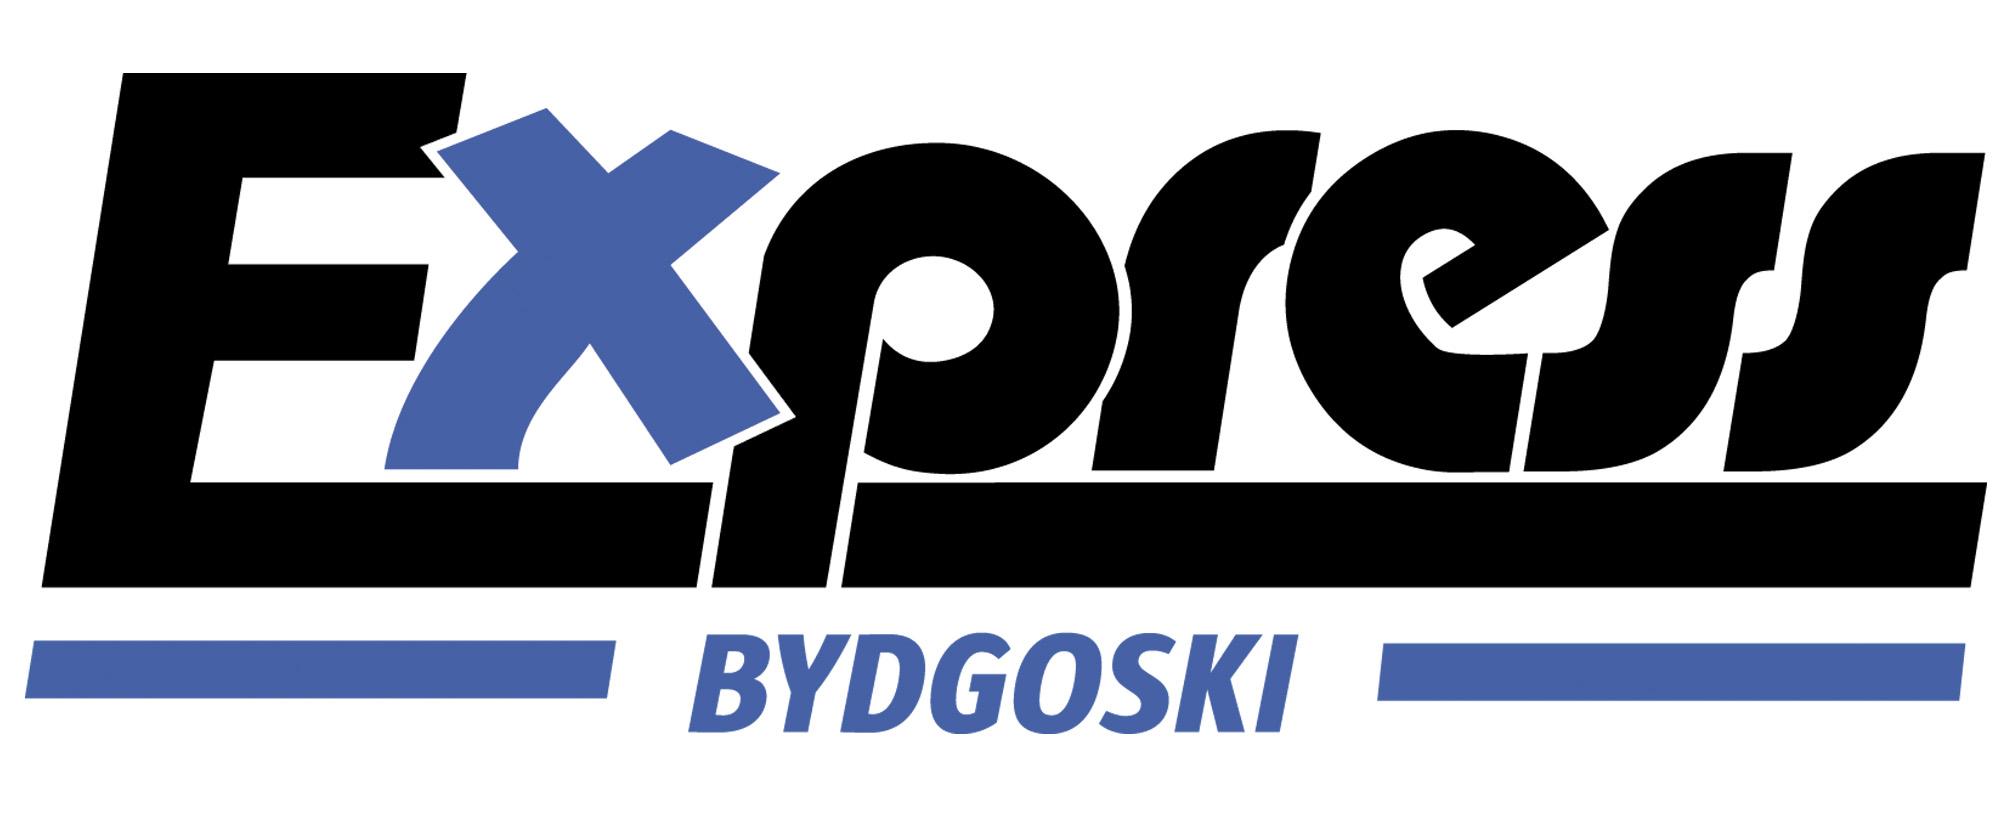 Espress Bydgoski